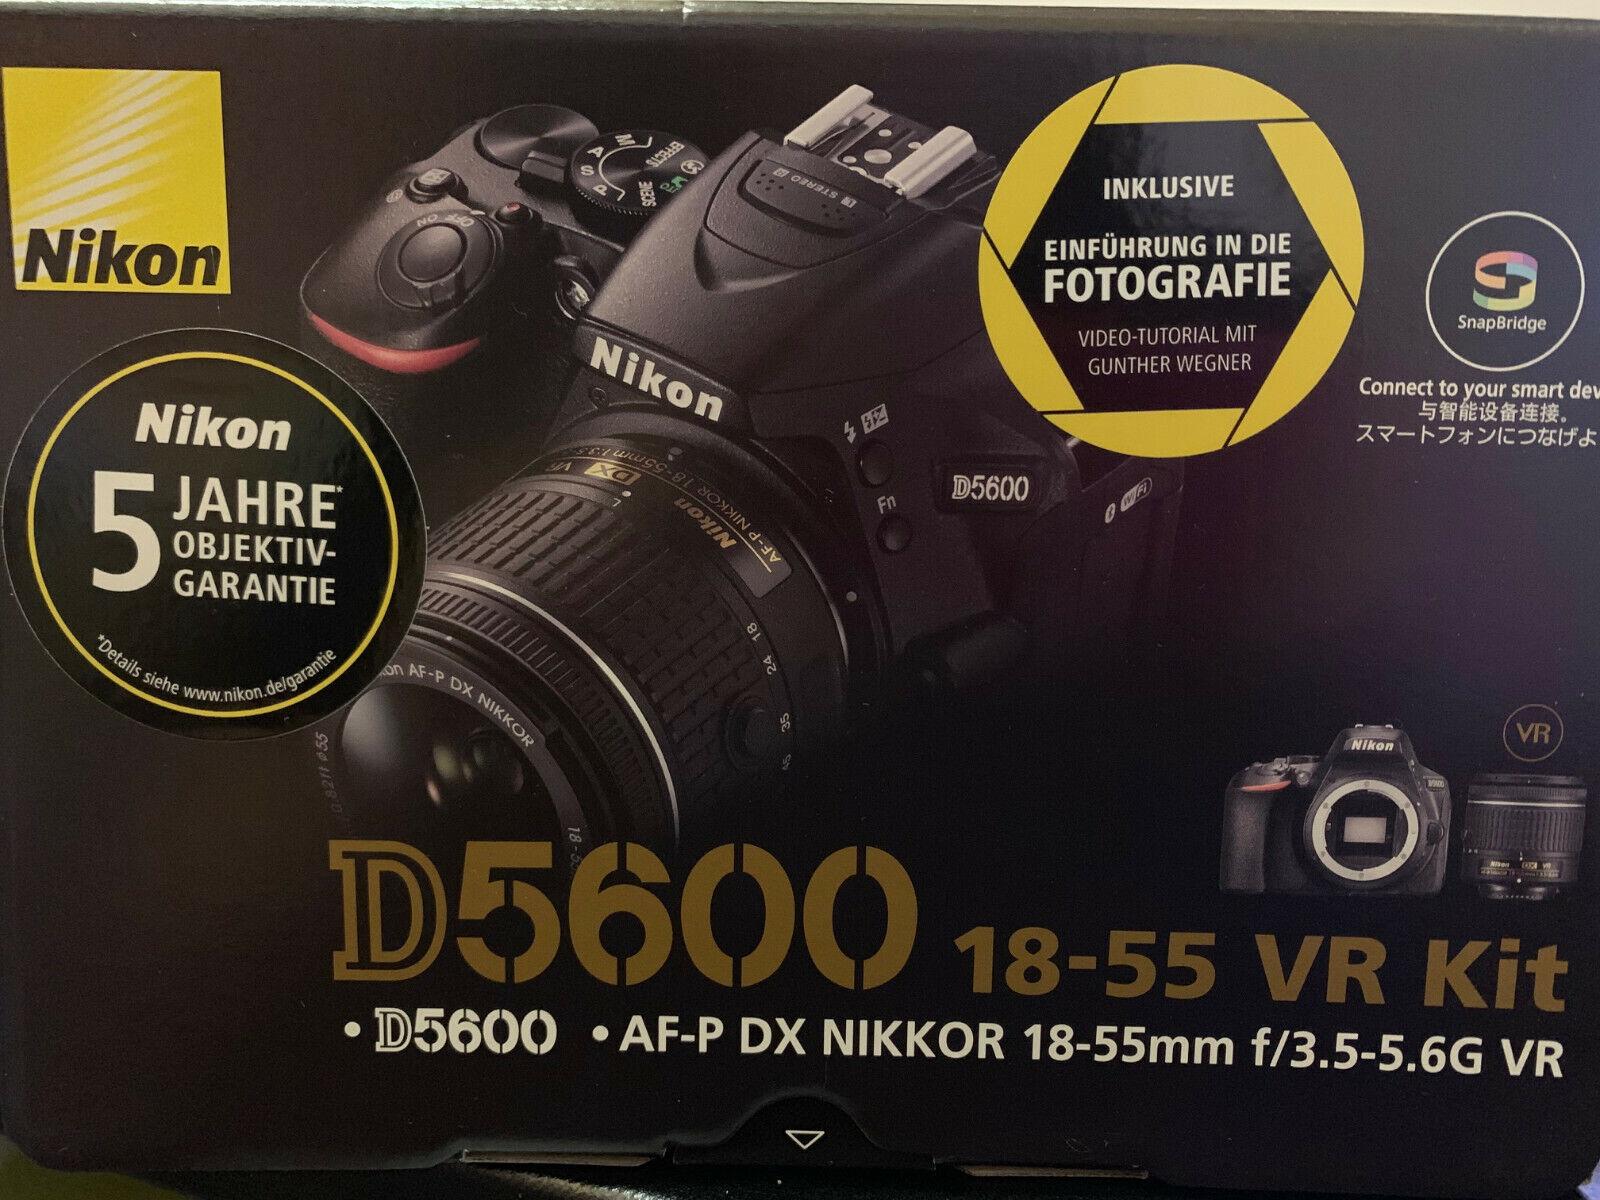 Nikon D5600 Kit Spiegelreflexkamera AF-P DX 18-55 VR 24,2 MP Bluetooth NFC WLAN